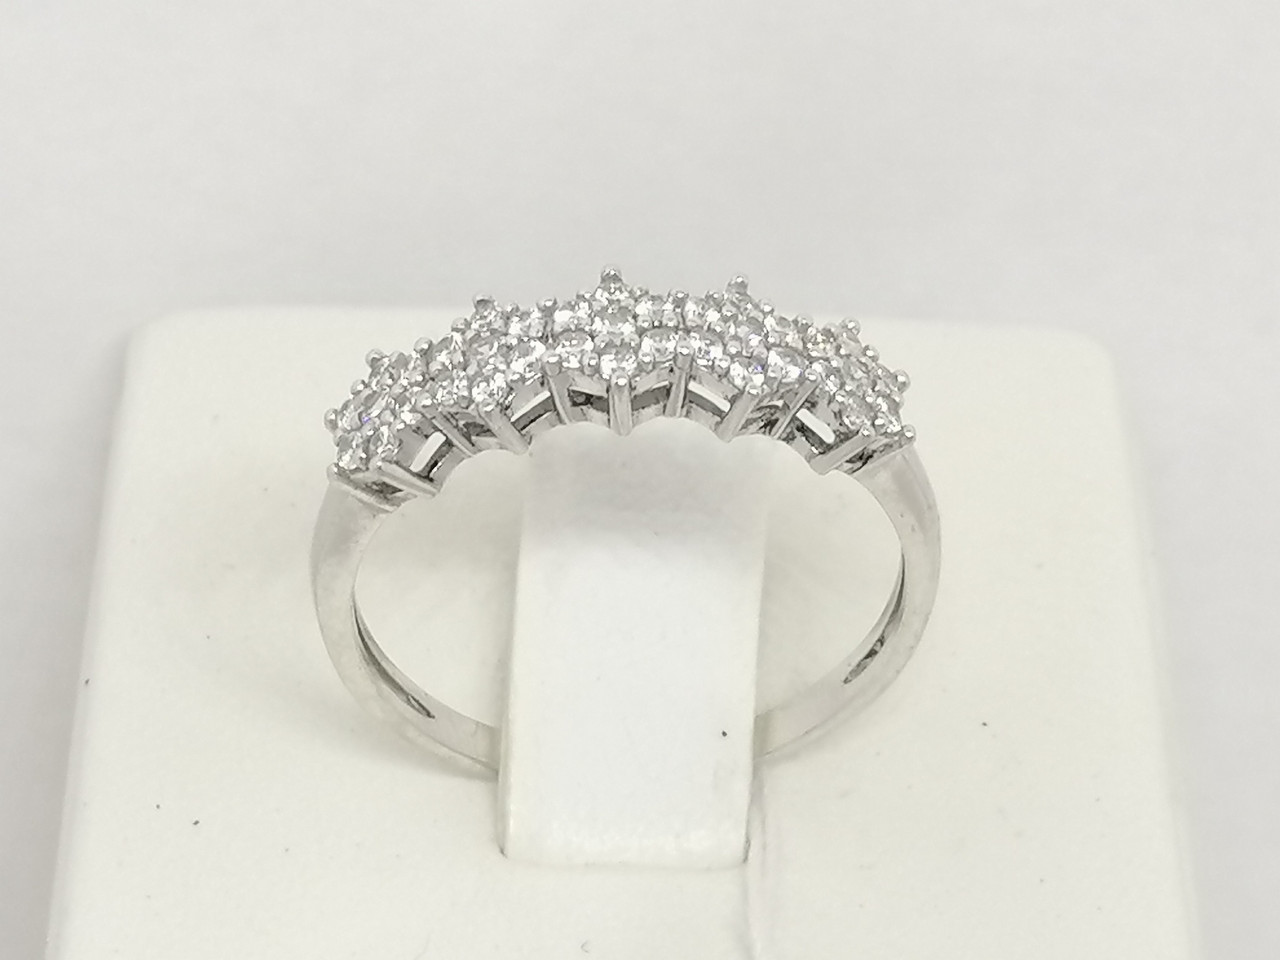 Серебряное кольцо Корона в камнях с фианитами. Артикул 1007/1Р-CZ 18,5